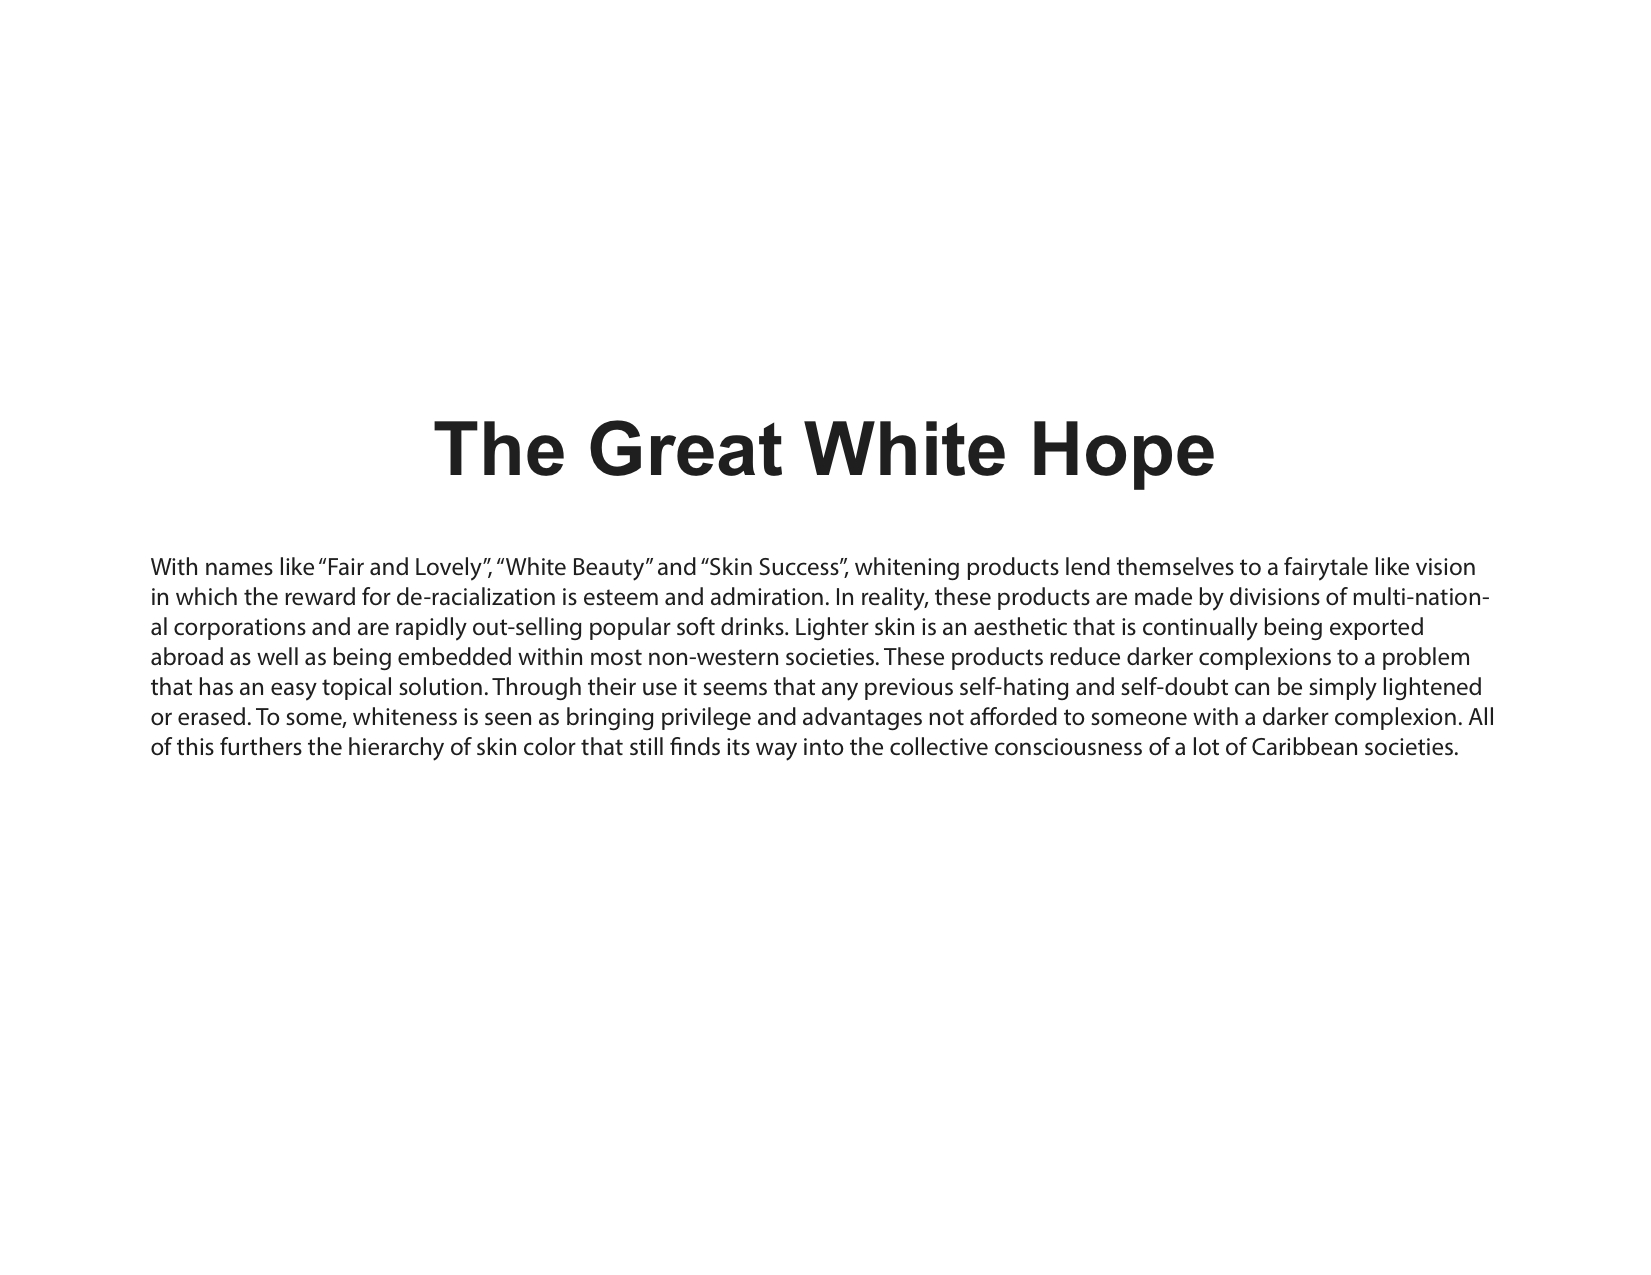 GreatWhite_JPEG_Statement.jpg